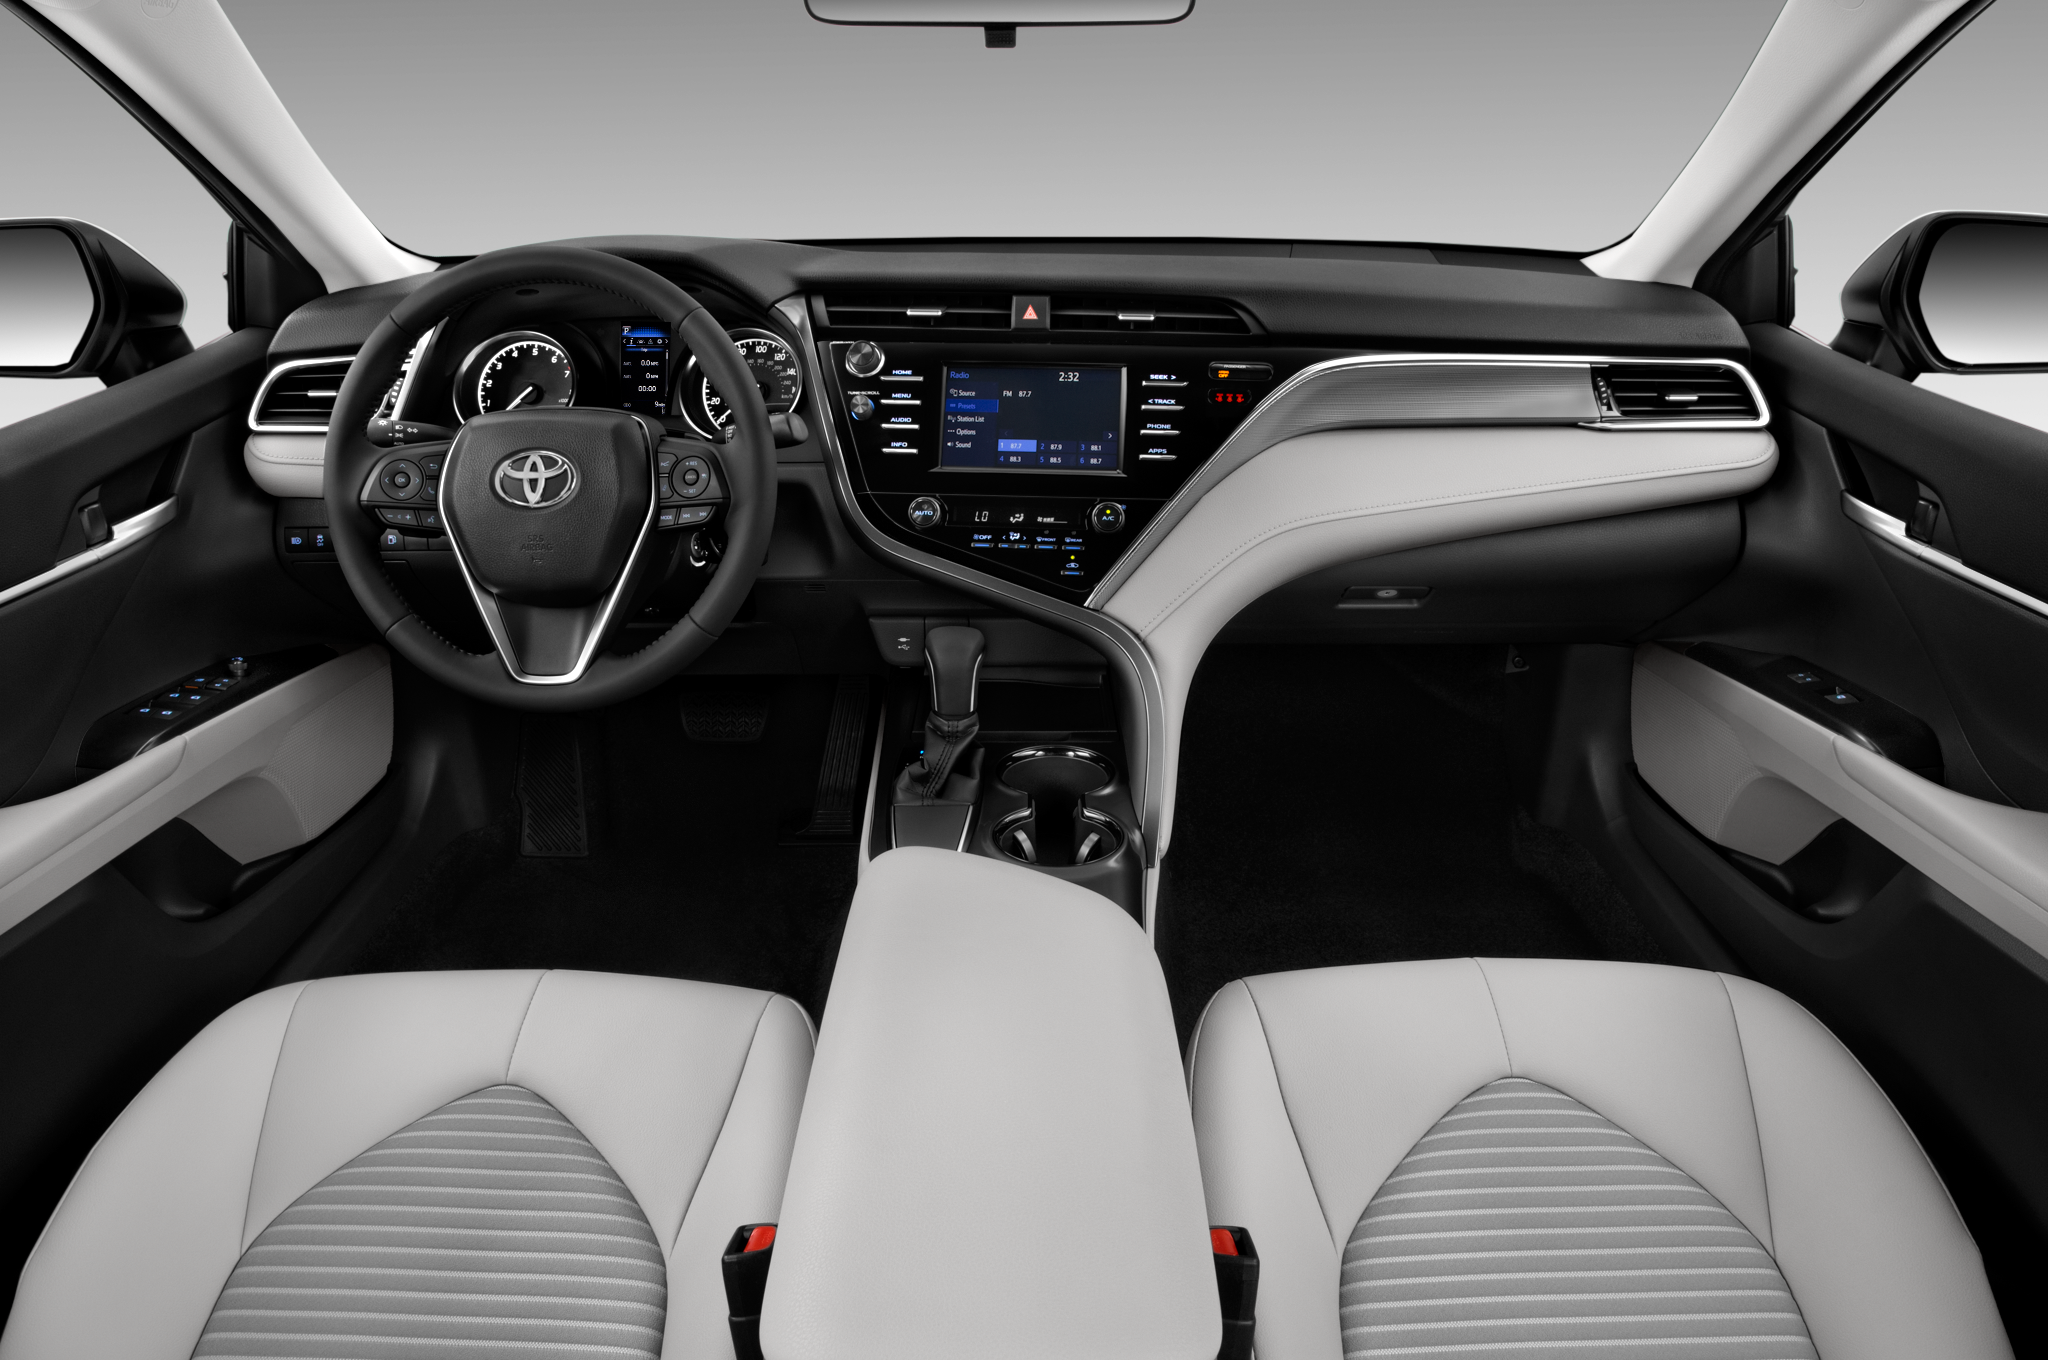 camry toyota interior dashboard corolla problems apple usnews cars sedan listings